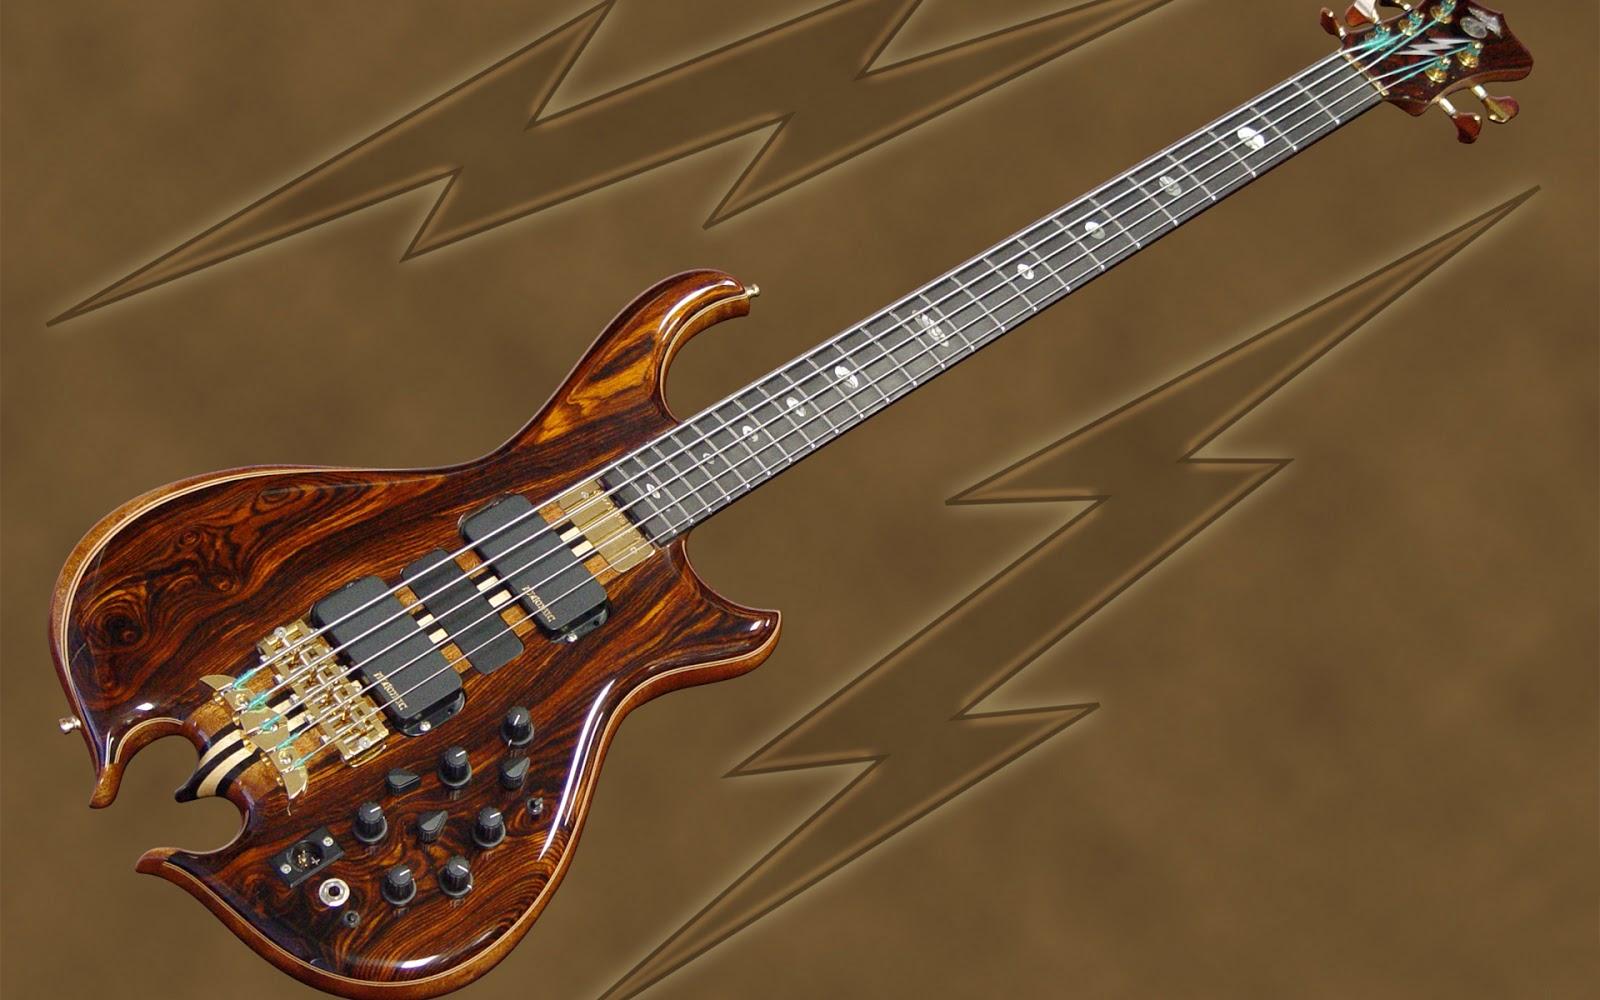 free download wallpaper hd guitar musical instruments